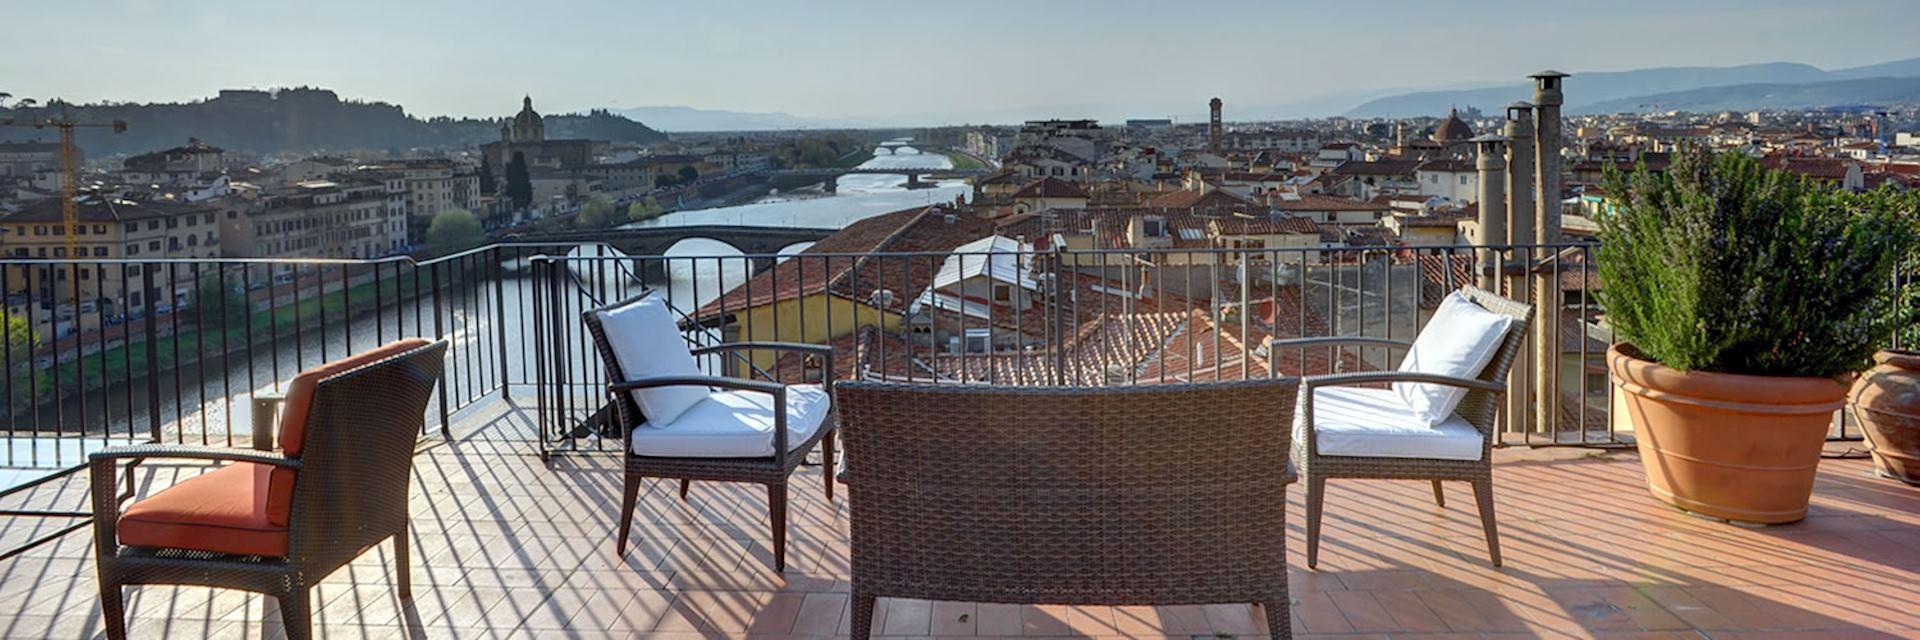 Rooftop terrace, Antica Torre di Via Tornabuoni